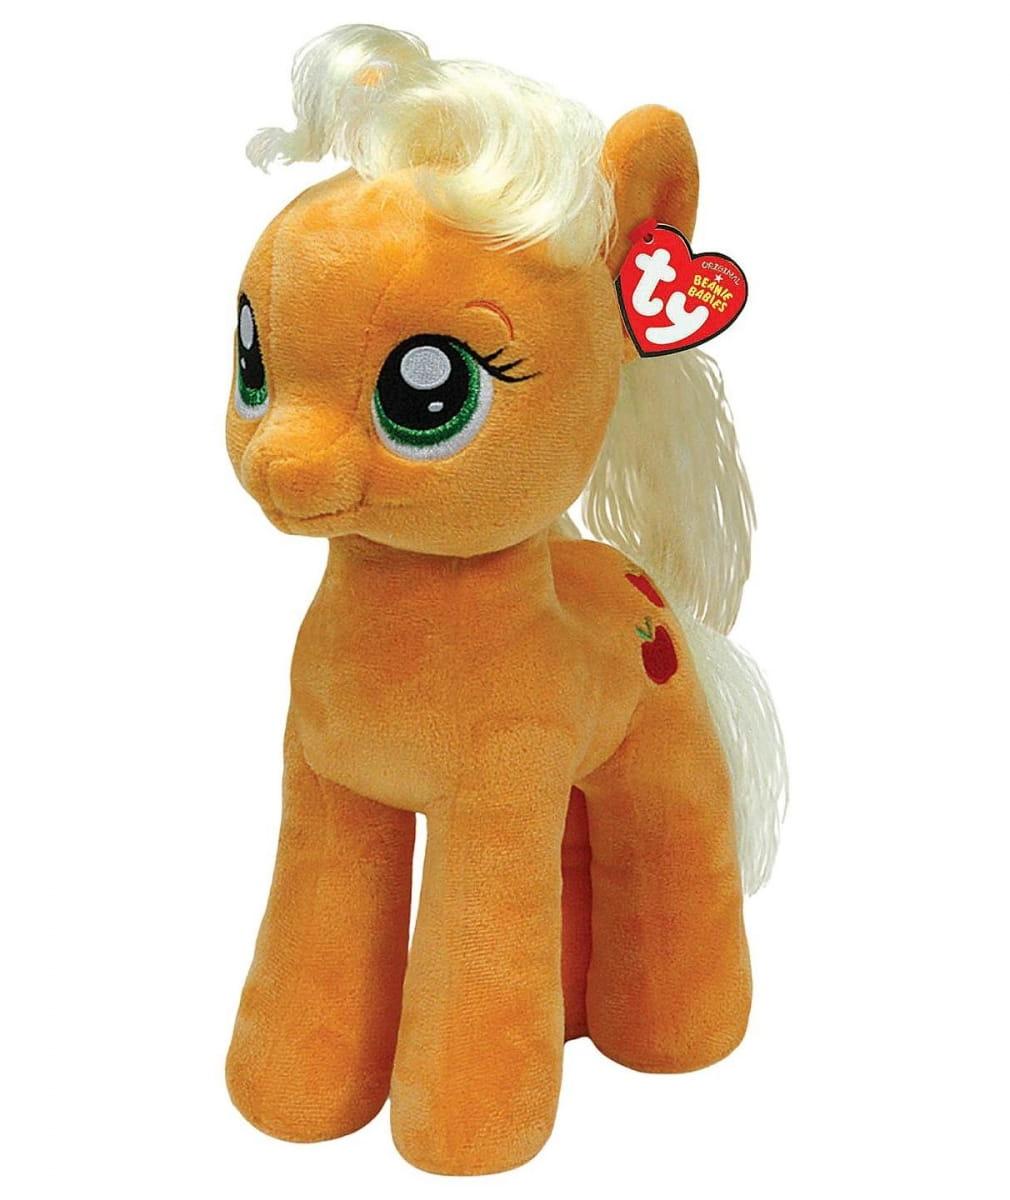 Мягкая игрушка My Little Pony Applejack Эплджек 51см (Hasbro)